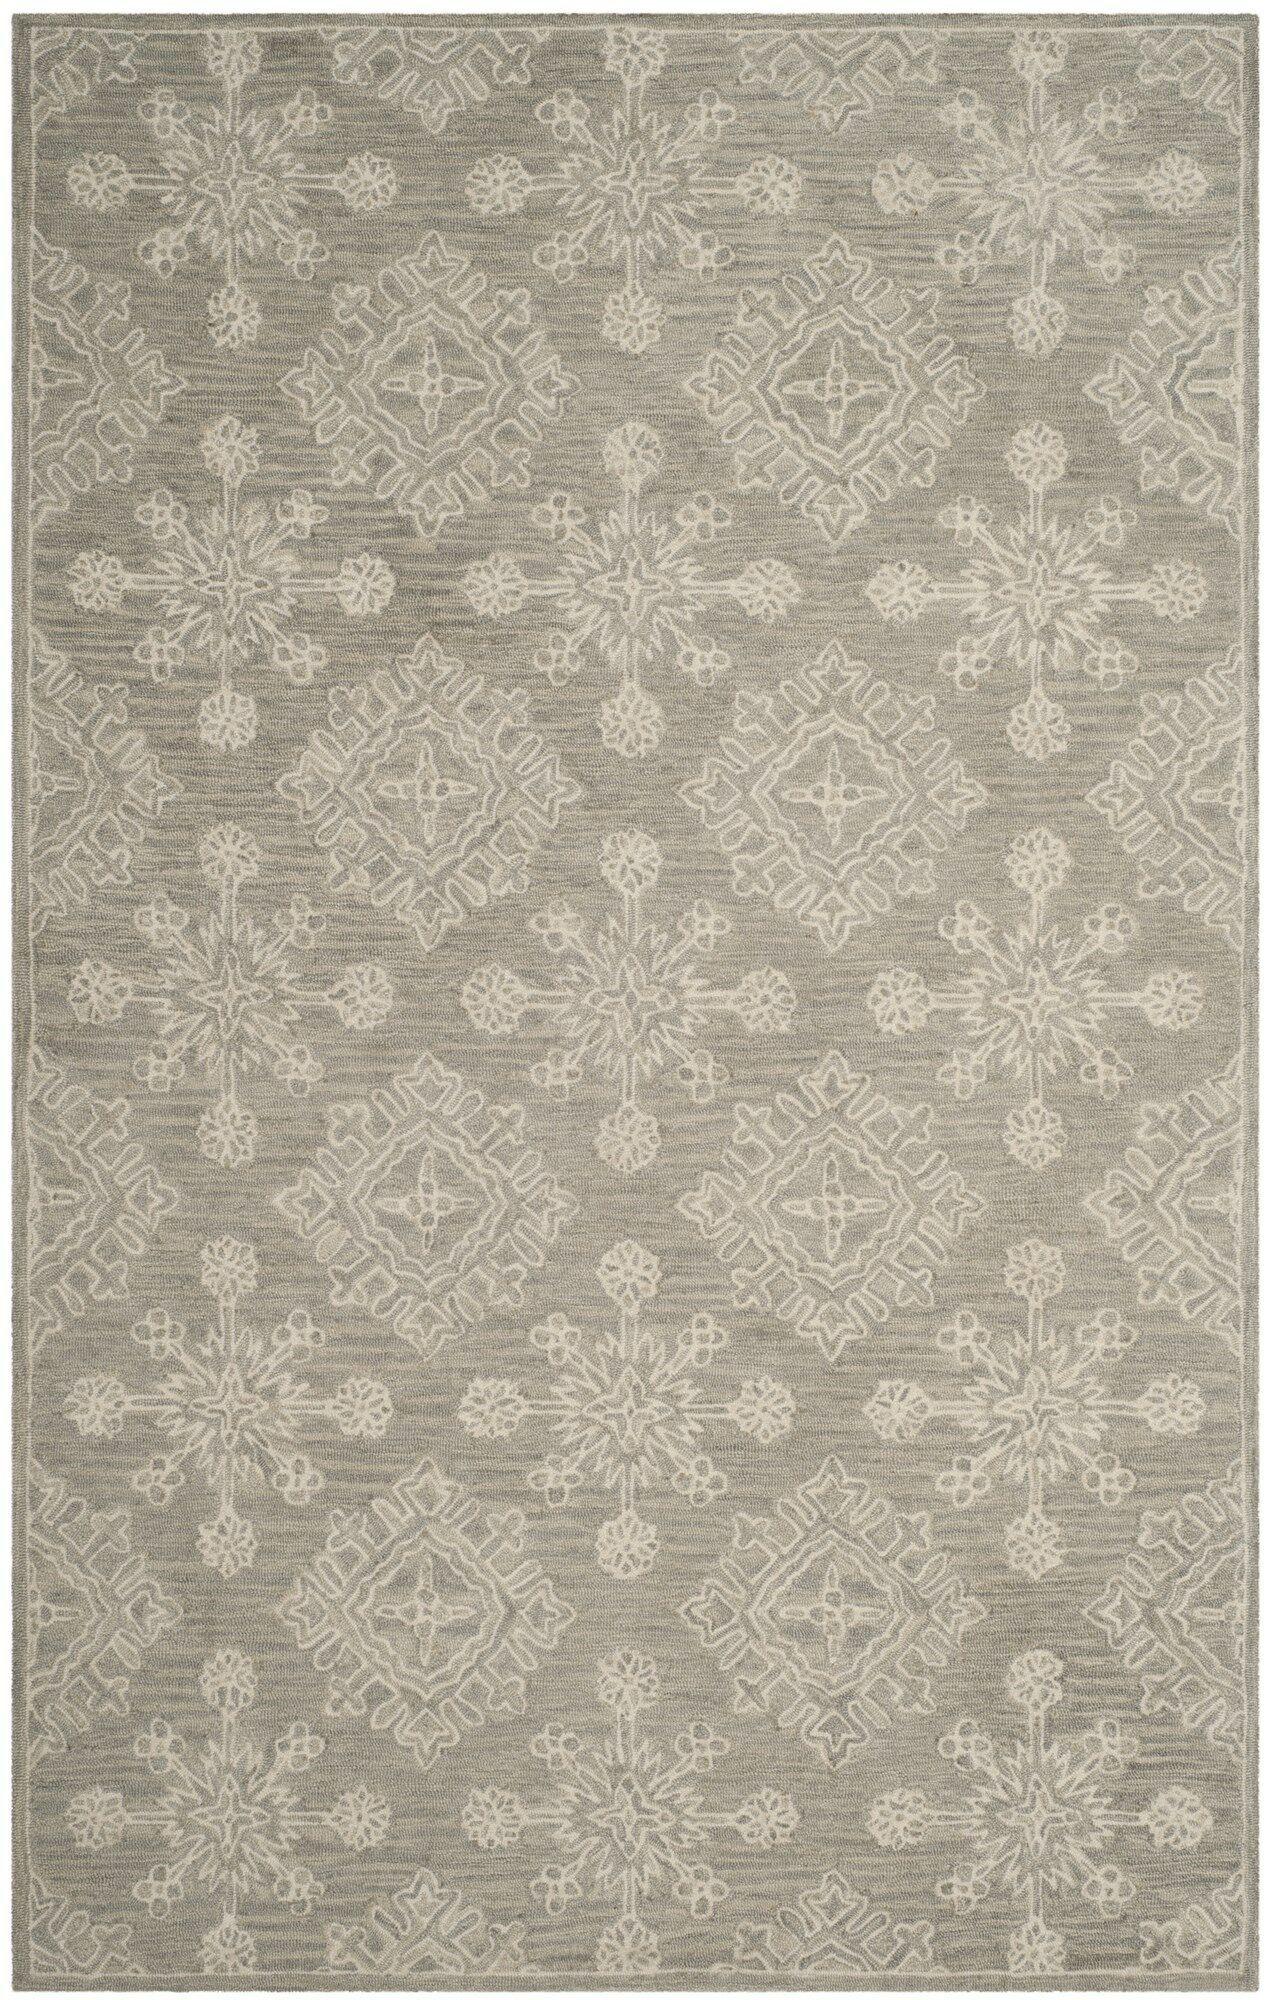 Skyla Hand-Tufted Light Beige Area Rug Rug Size: Rectangle 4' x 6'